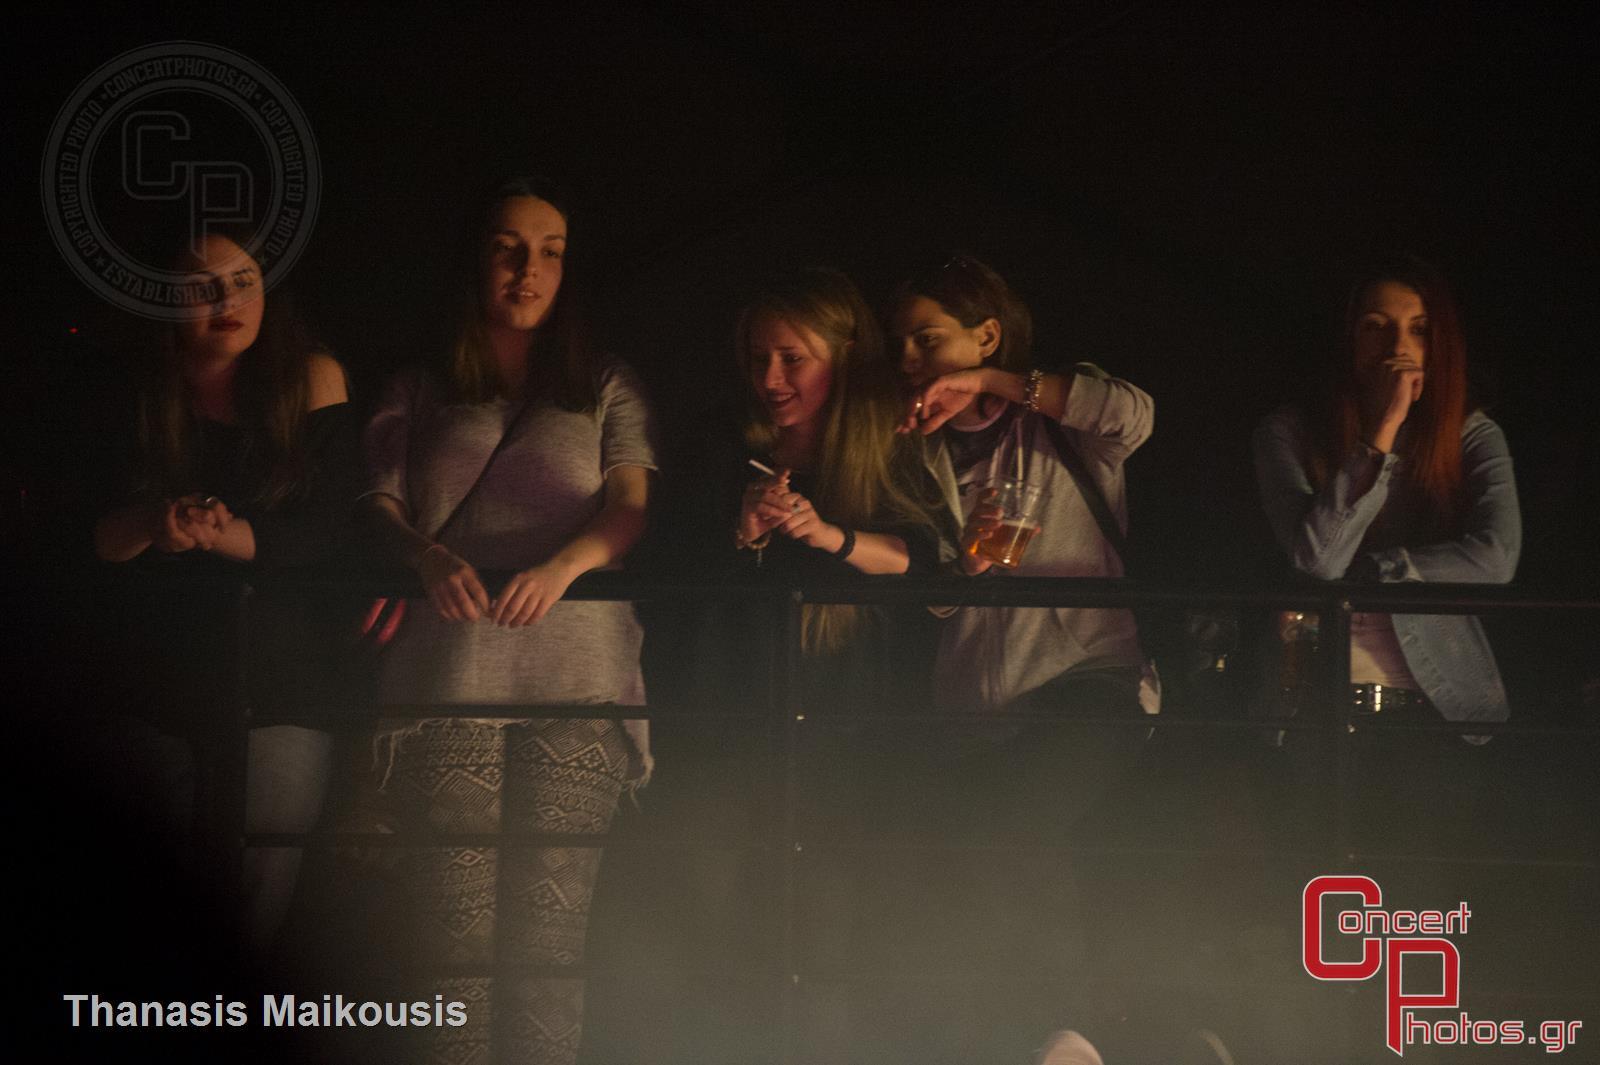 Tricky - Spectralfire-Tricky - Spectralfire photographer: Thanasis Maikousis - concertphotos_-3603